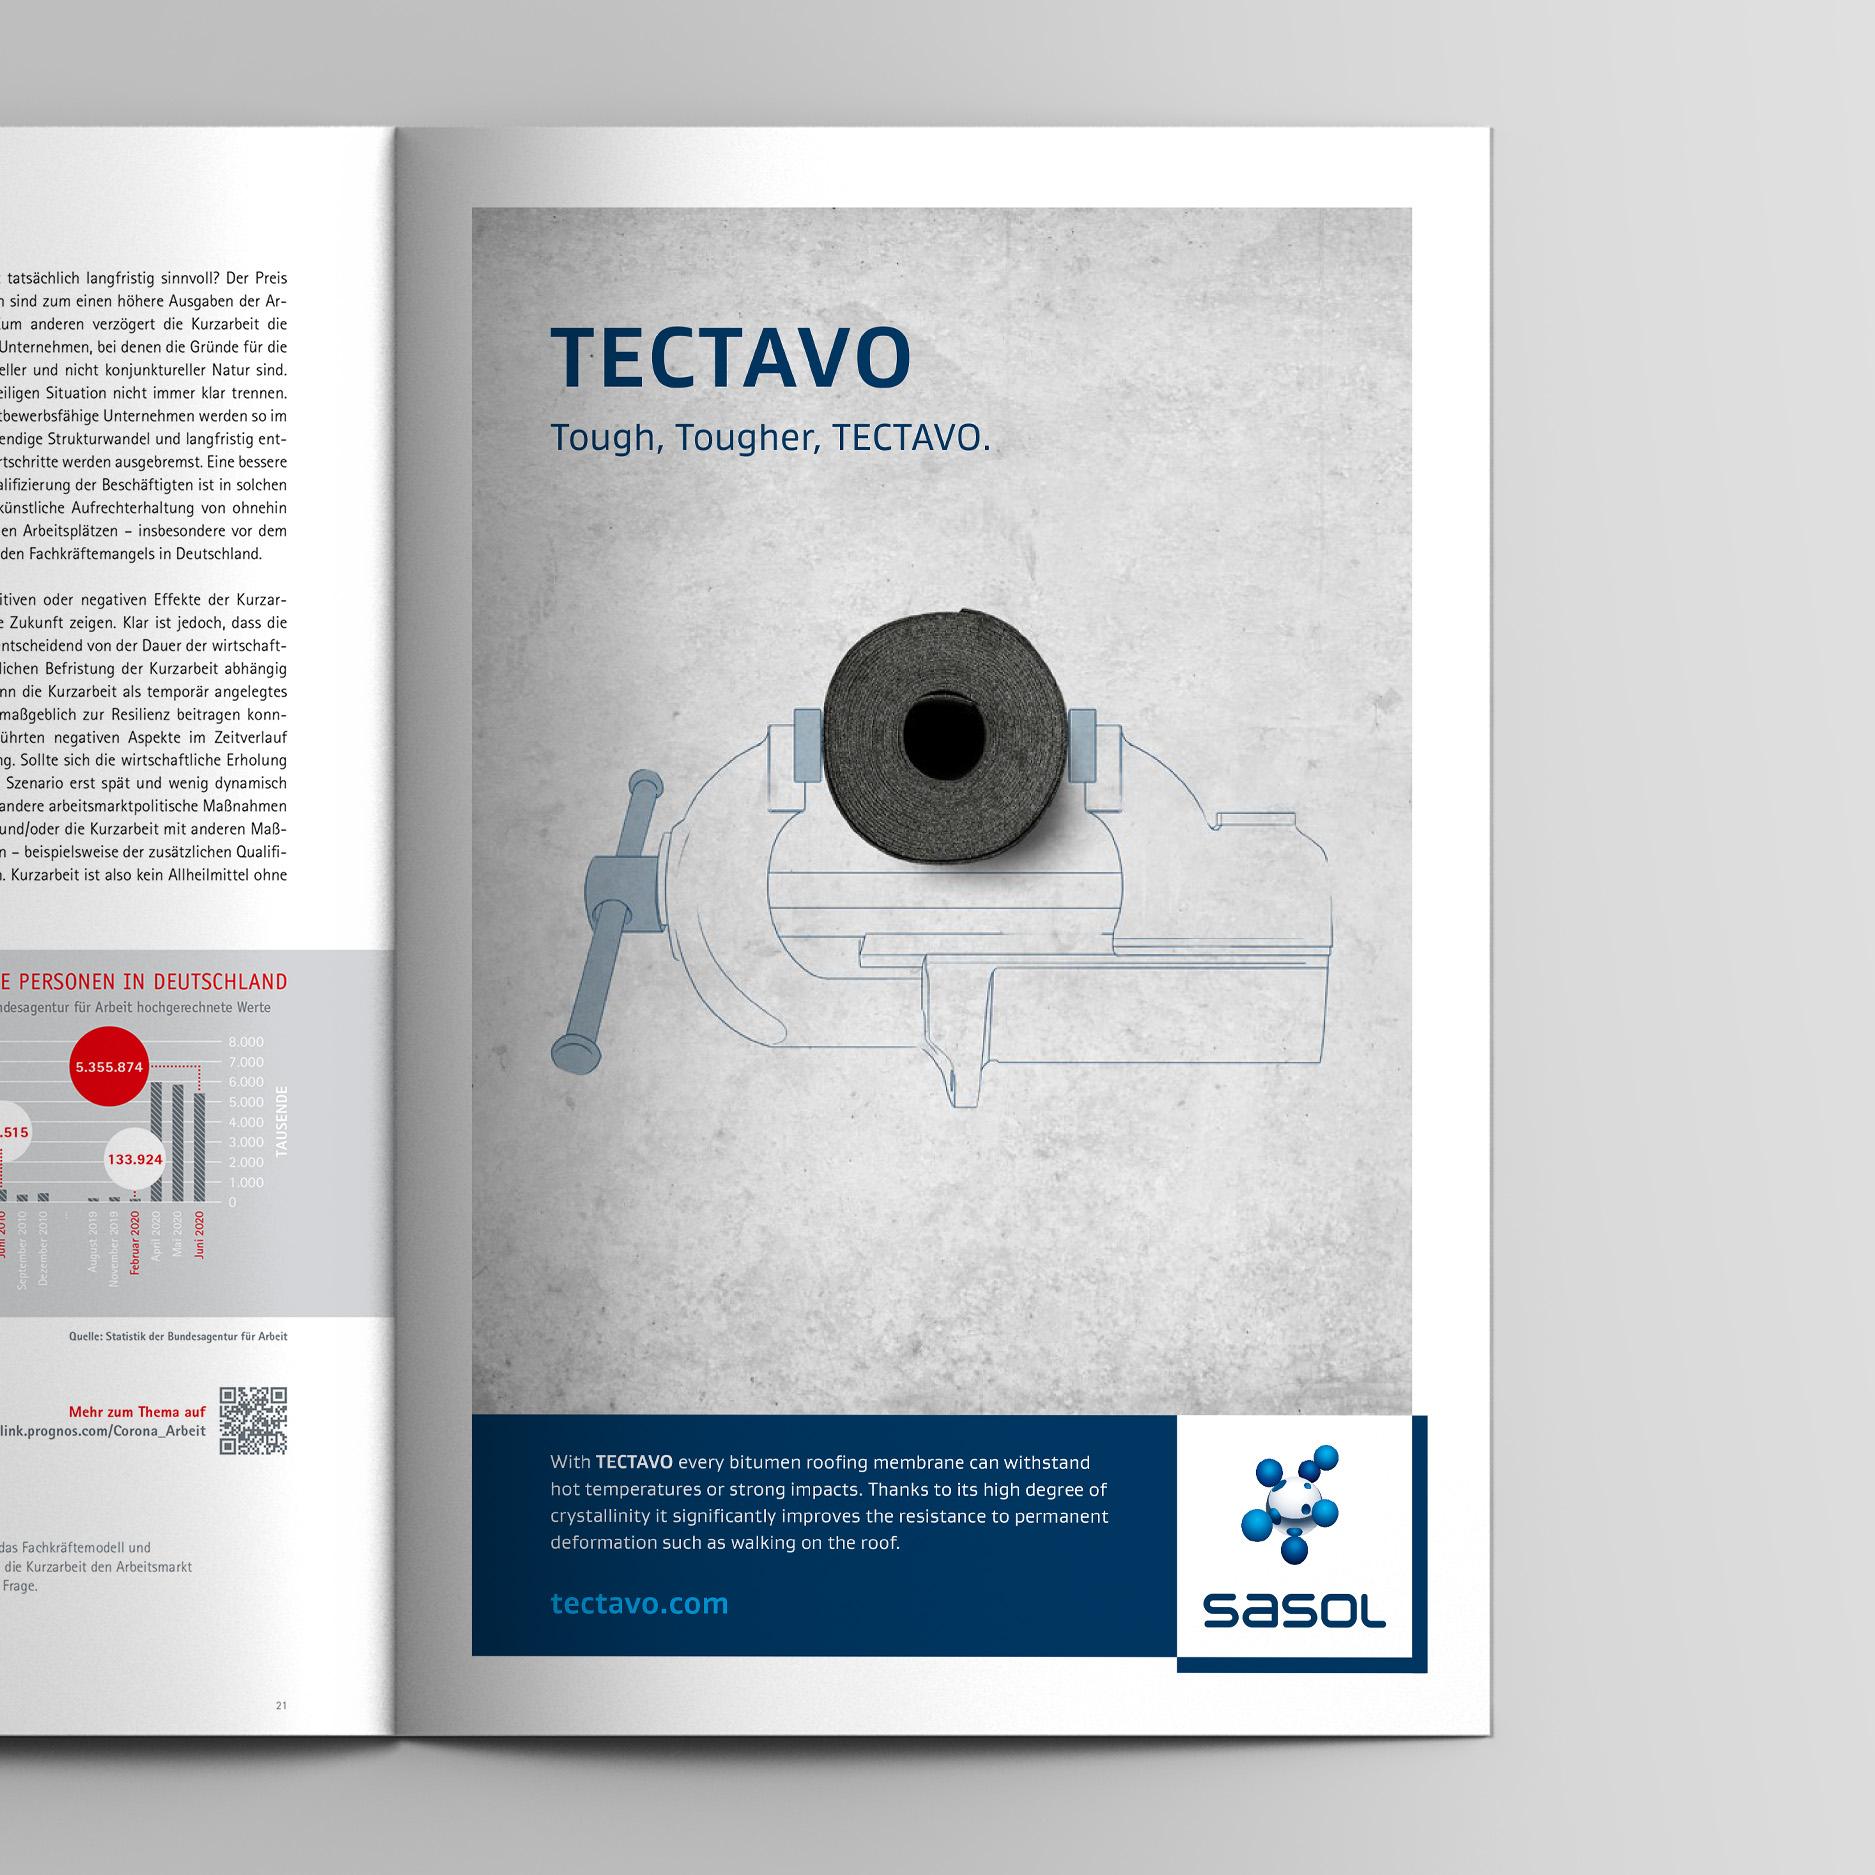 Keyvisual – Anzeige Widerstandsfähigkeit (Sasol, Tectavo Productlaunch)